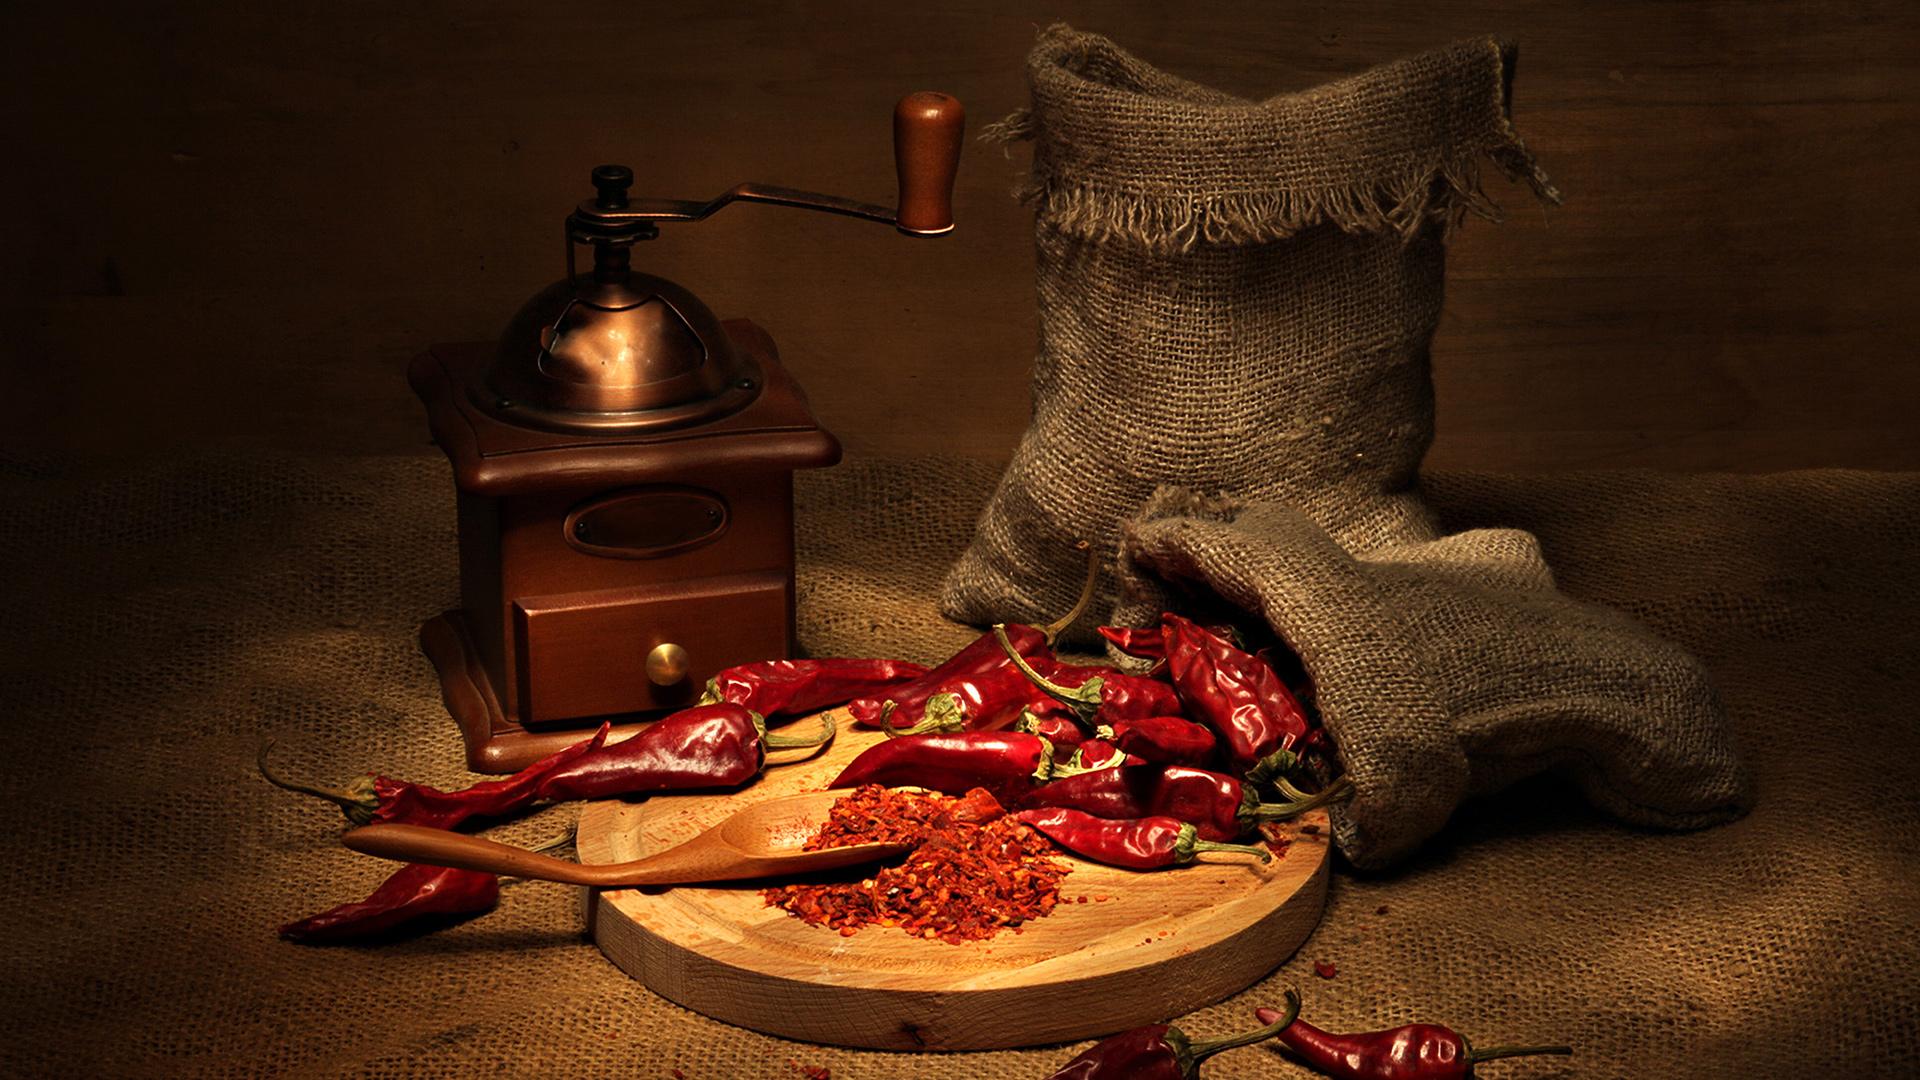 Food - Pepper  Wallpaper